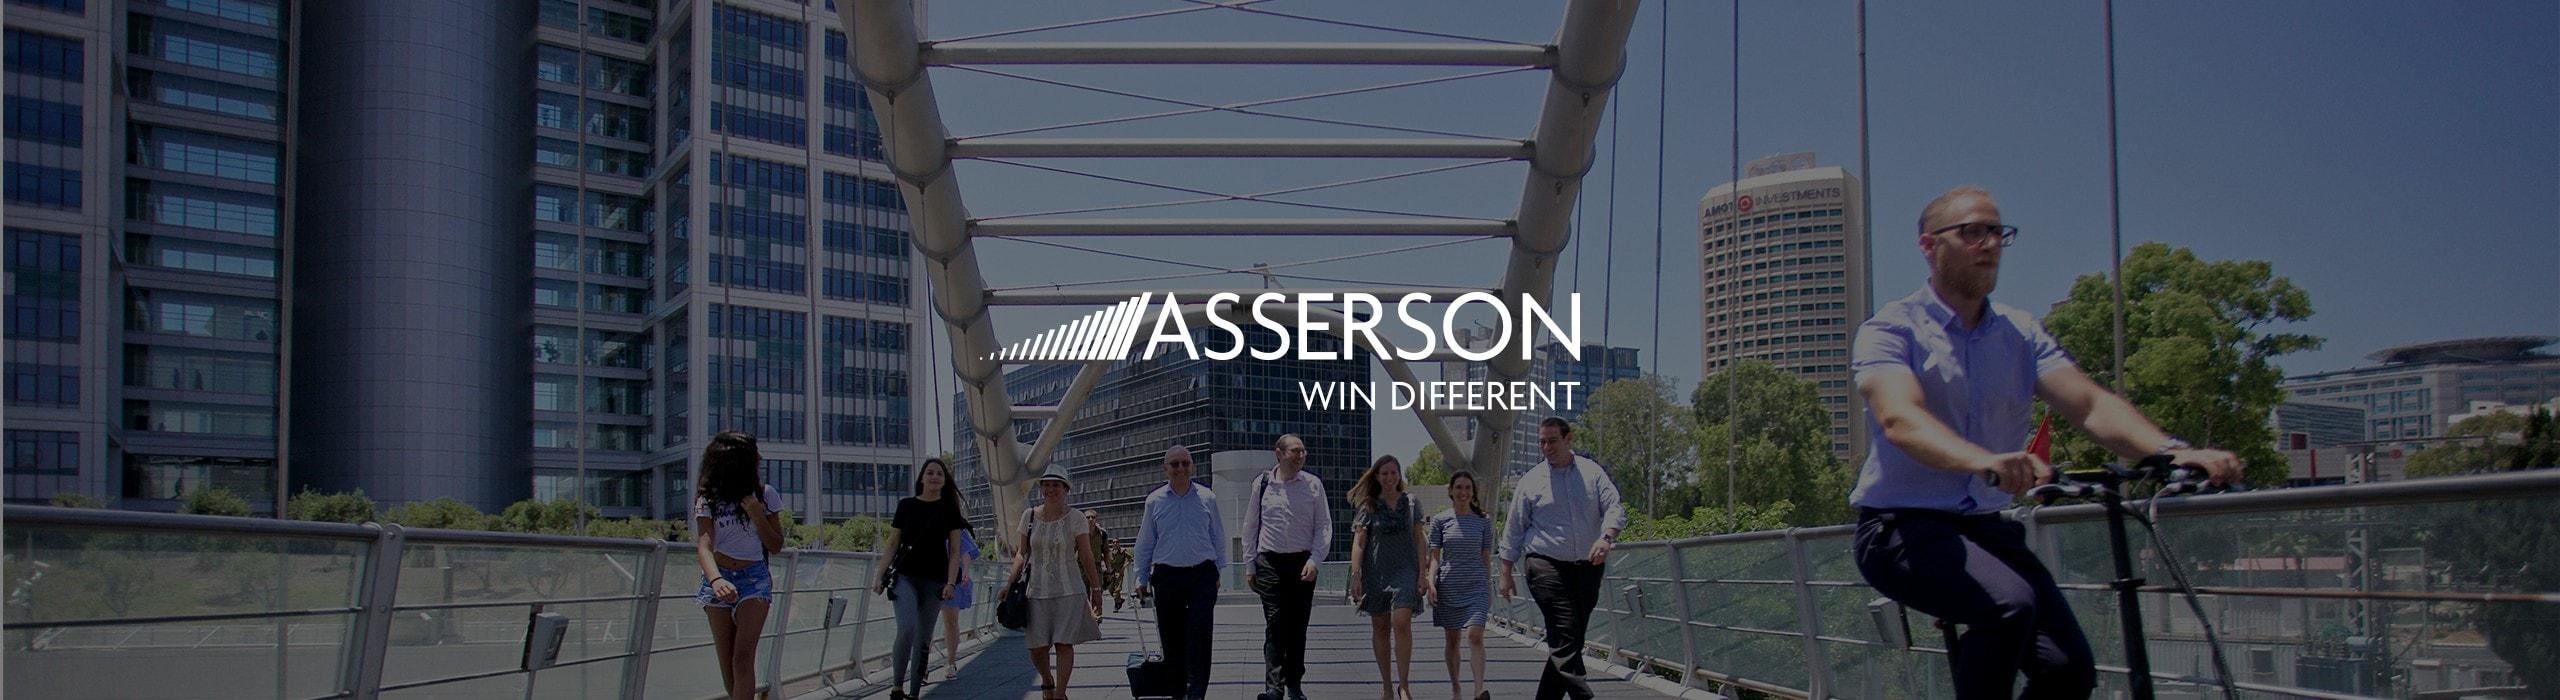 Asserson - natie-asserson-top - Natie Branding Agency